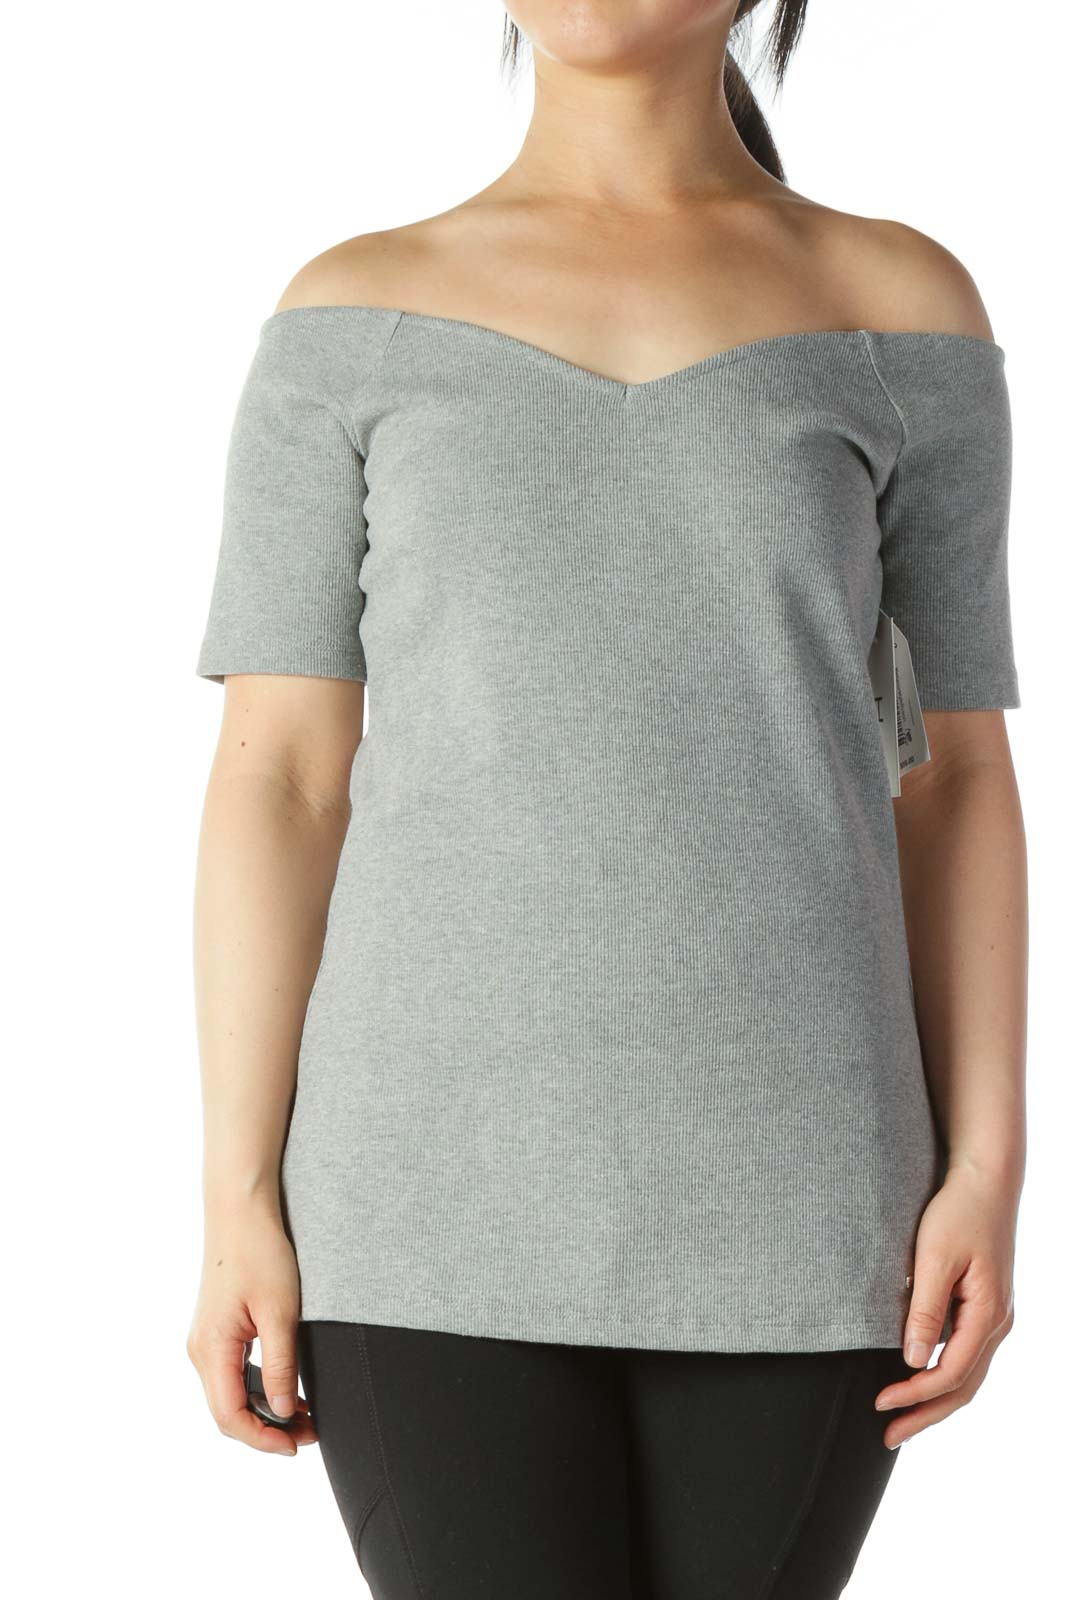 Gray V-Neck Cold Shoulders Stretch Top Front